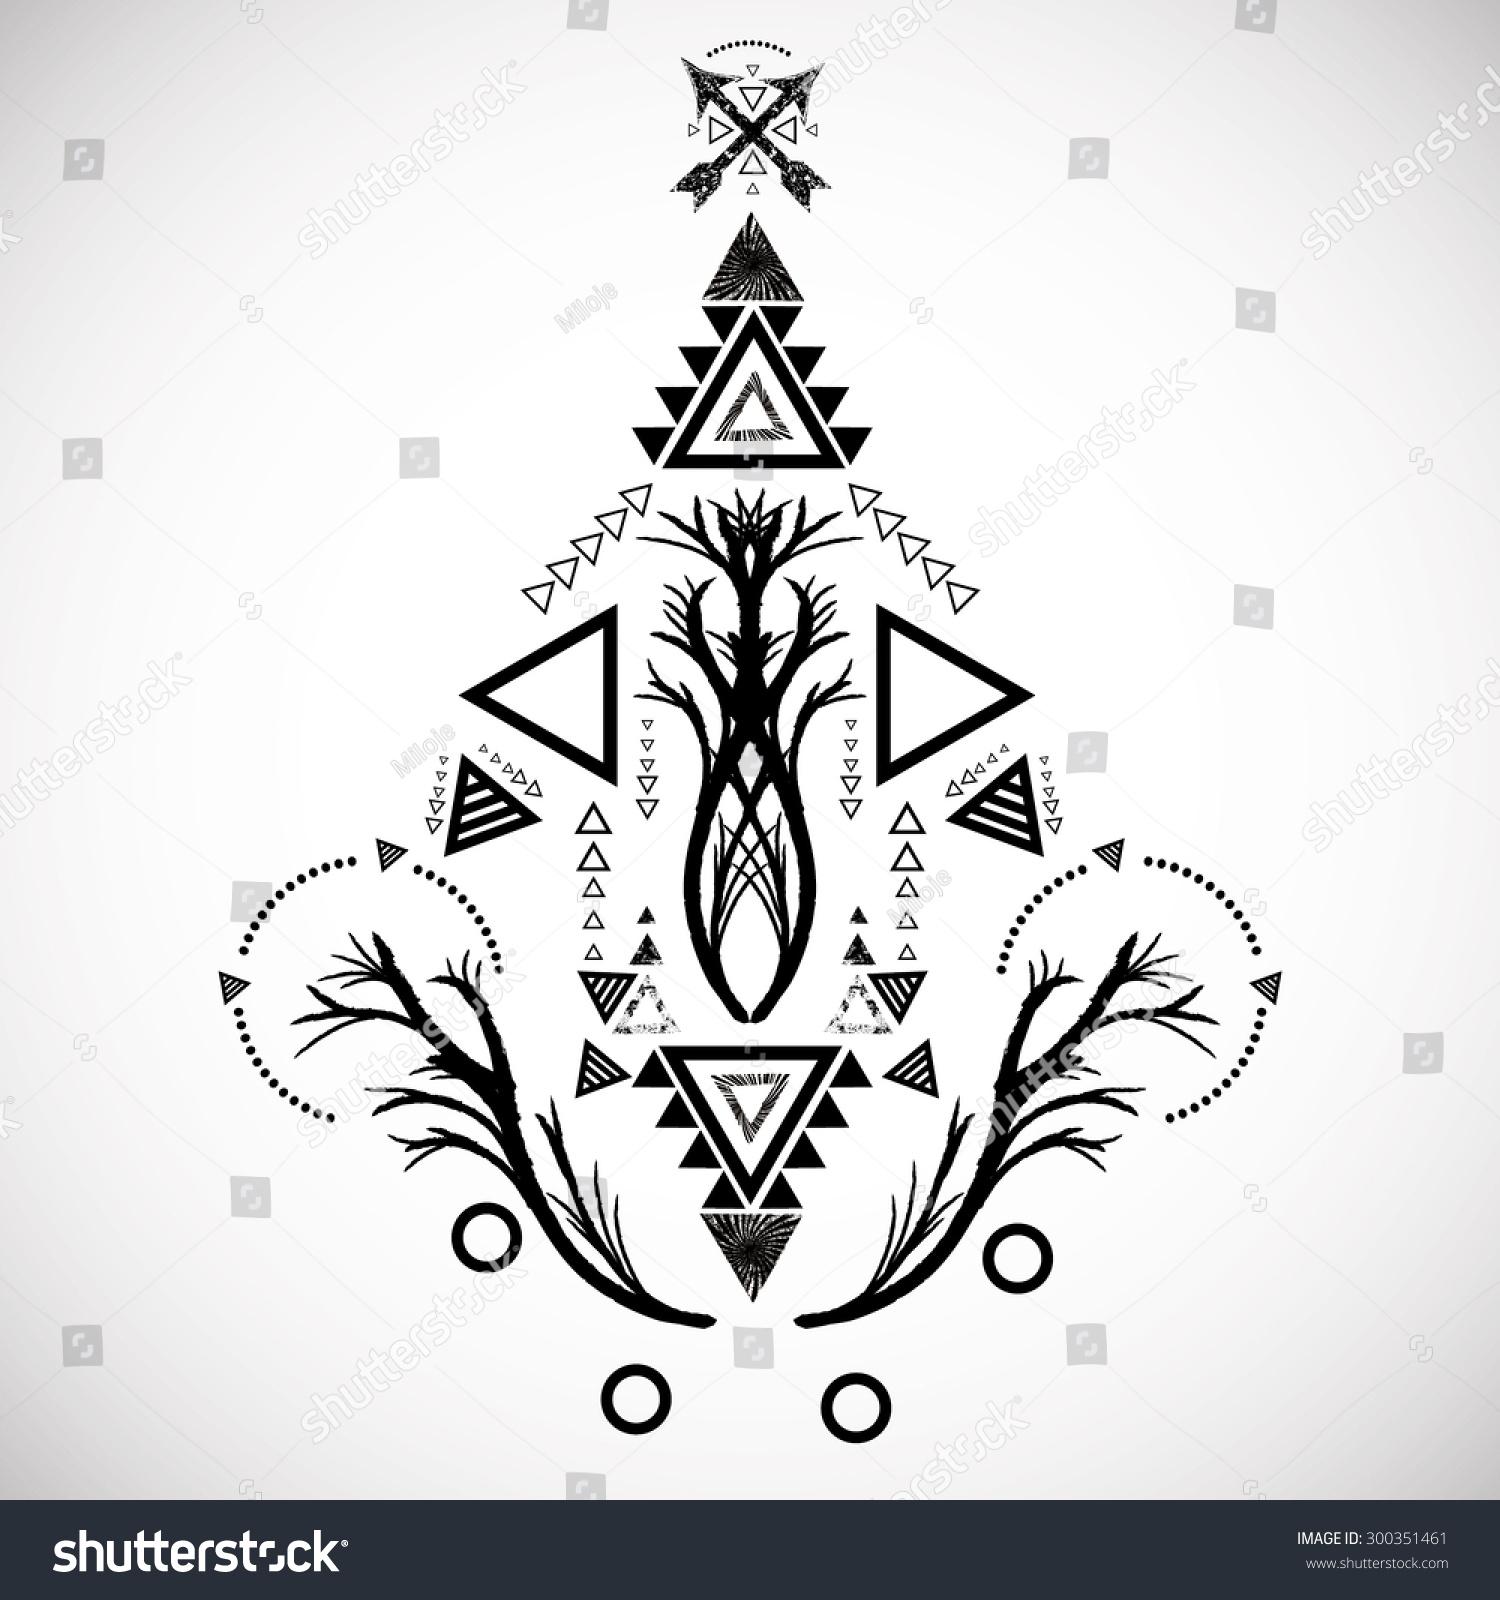 Tribal ethnic aztec geometric element vector stock vector tribal ethnic aztec geometric element vector illustration ornament decorative symbol isolated on white background biocorpaavc Gallery